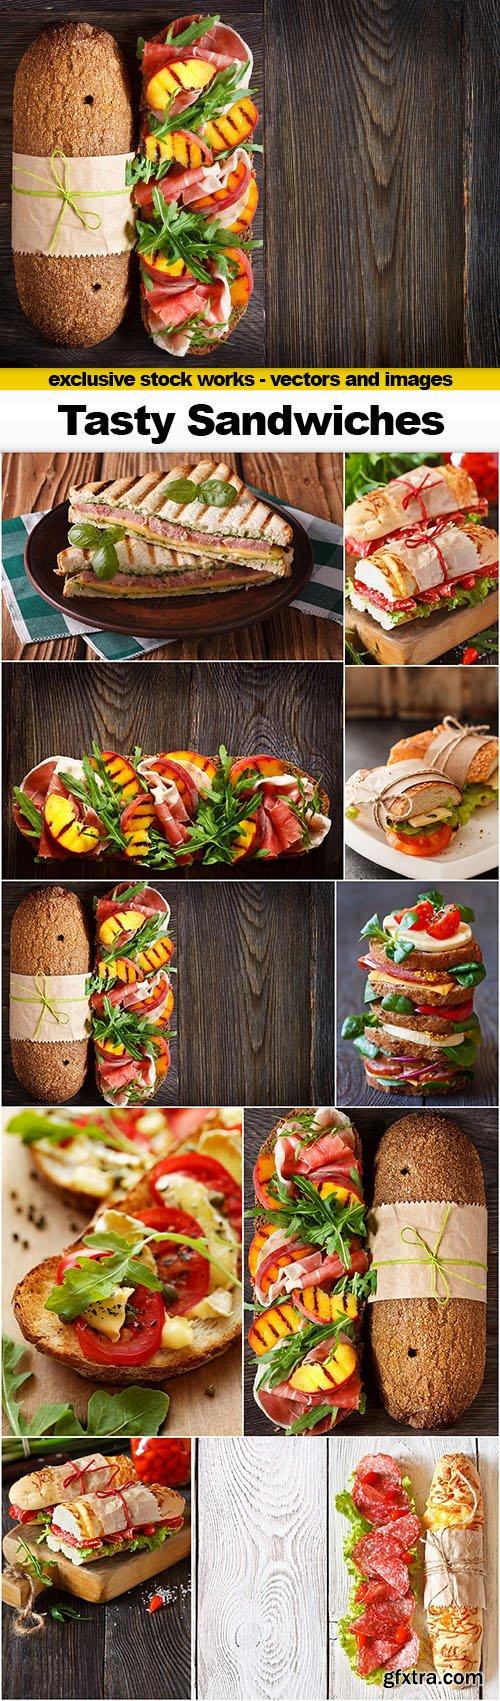 Tasty Sandwiches - 10x UHQ JPEG